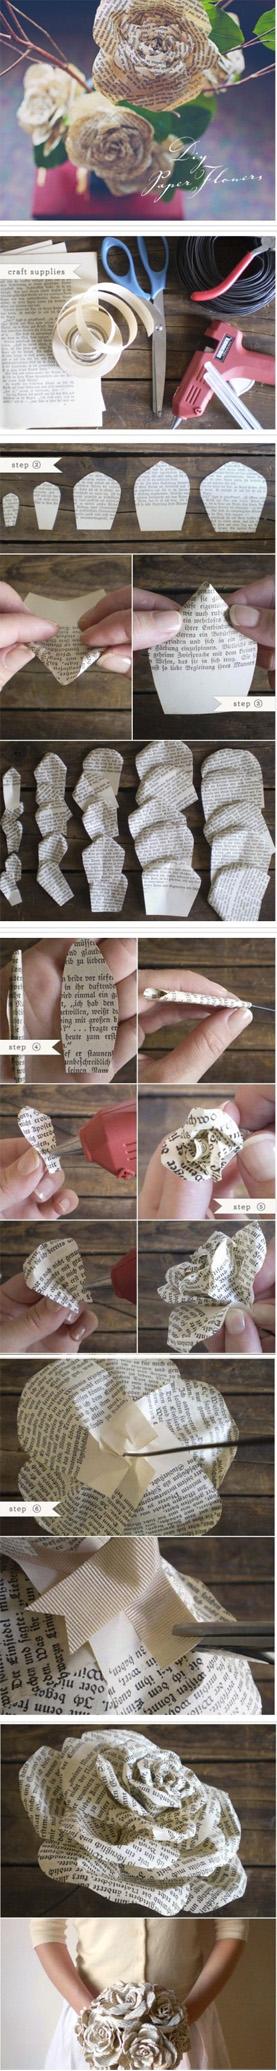 Inexpensive table centerpieces idea.